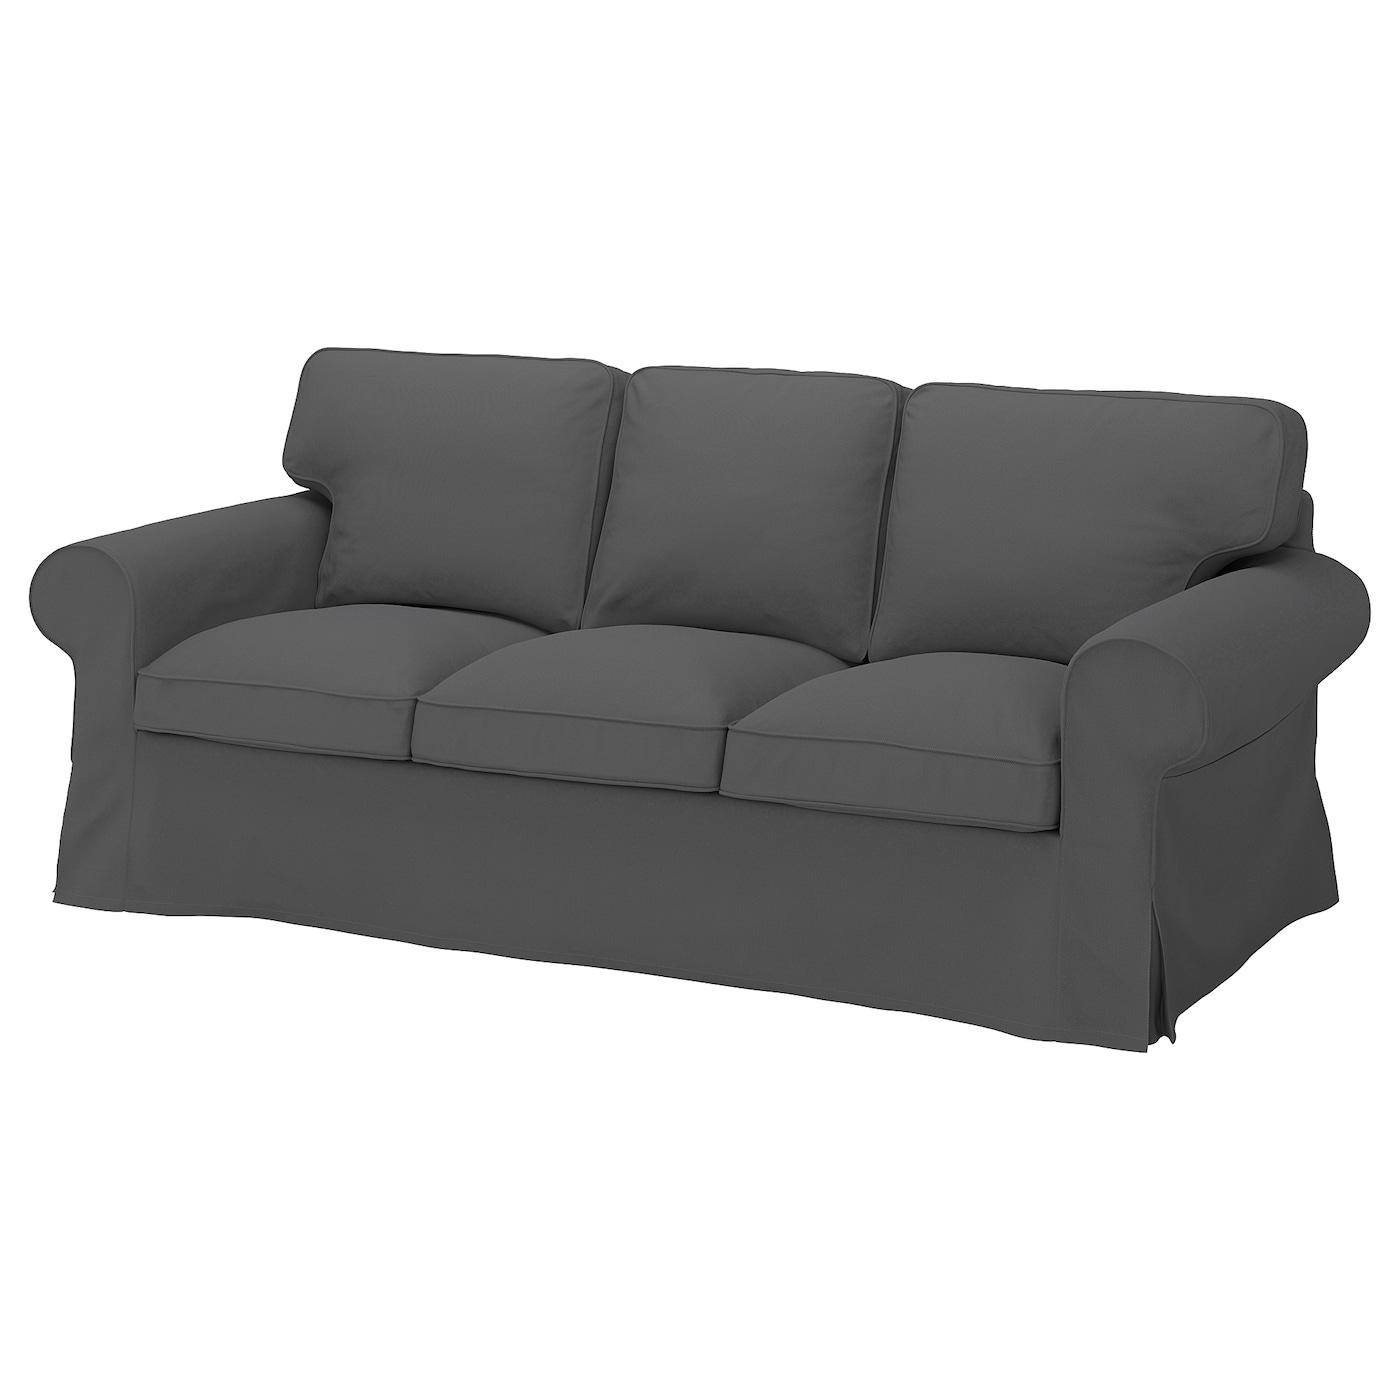 Ektorp Cover For 3 Seat Sofa Hallarp Grey Ikea